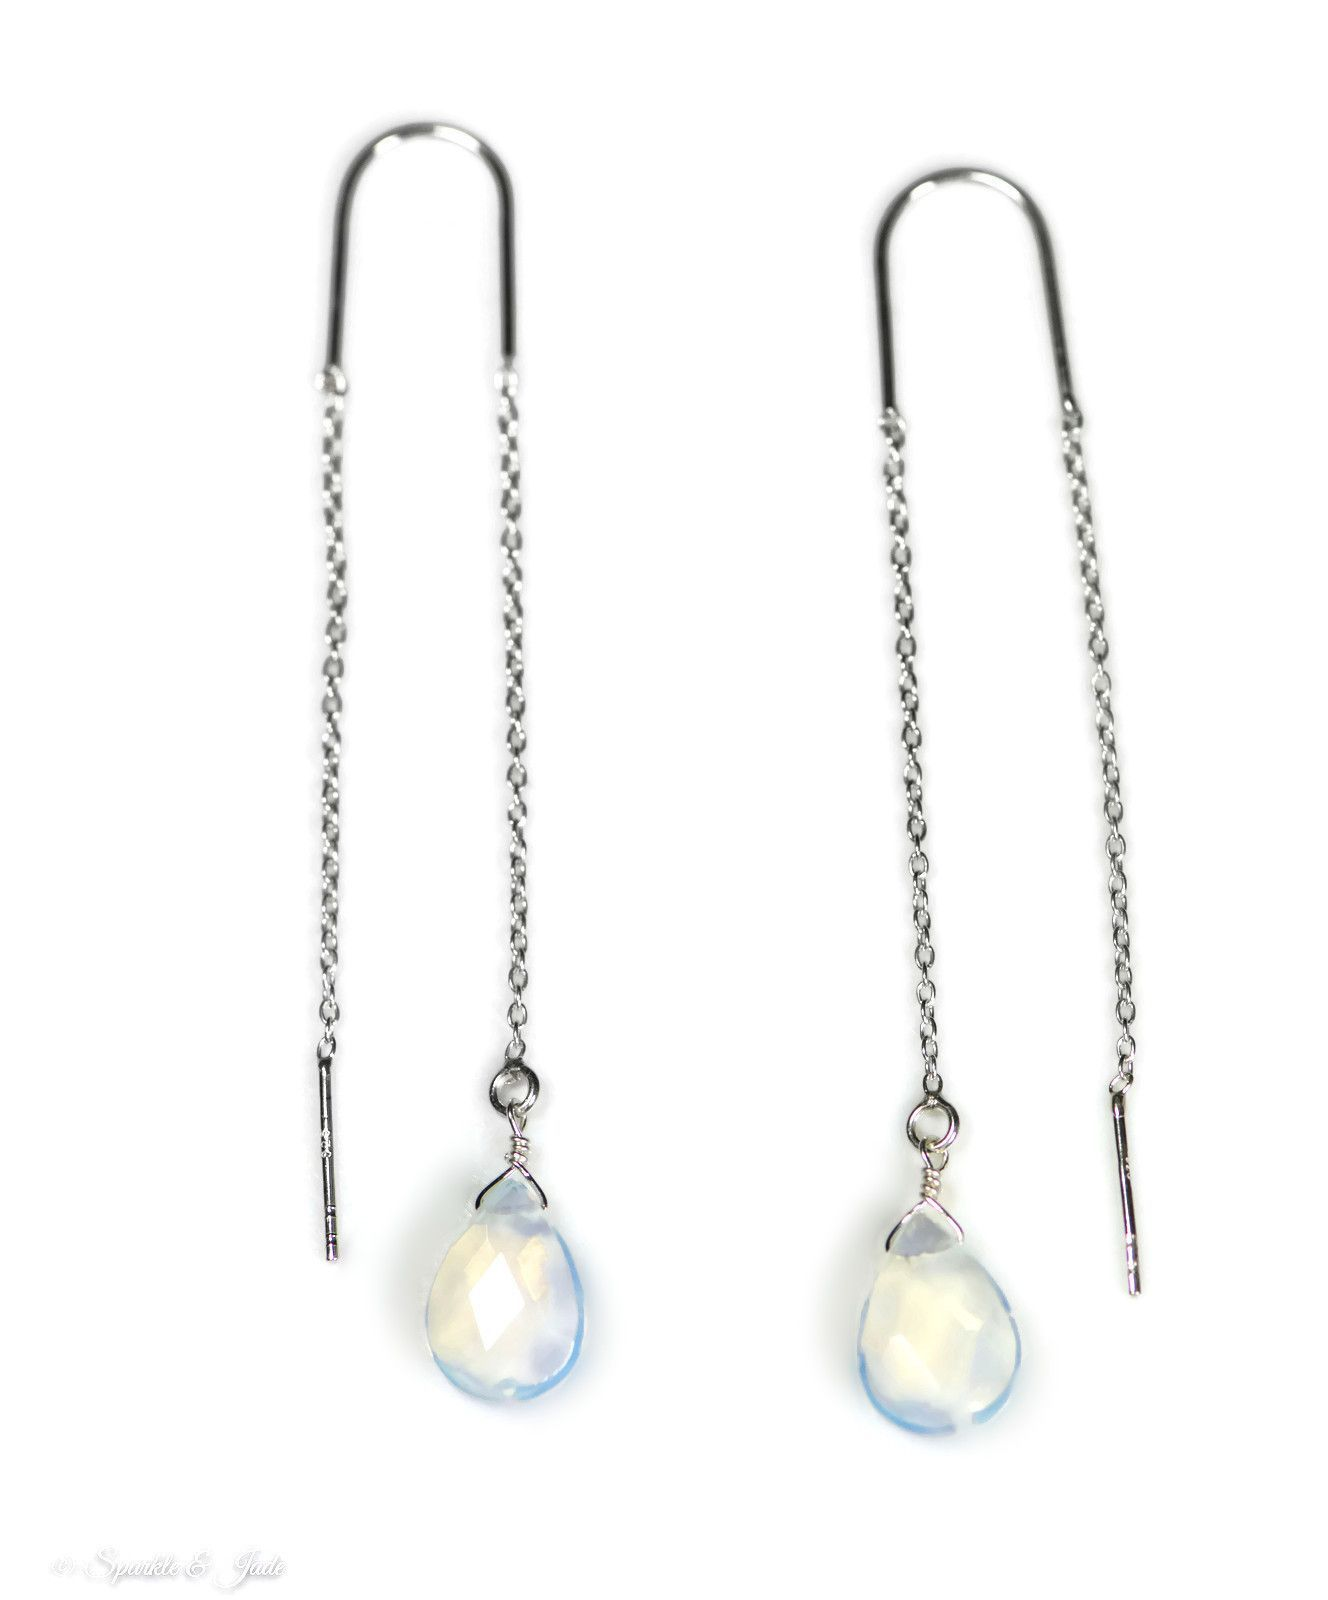 Faceted Pearl SilverThreader Earrings